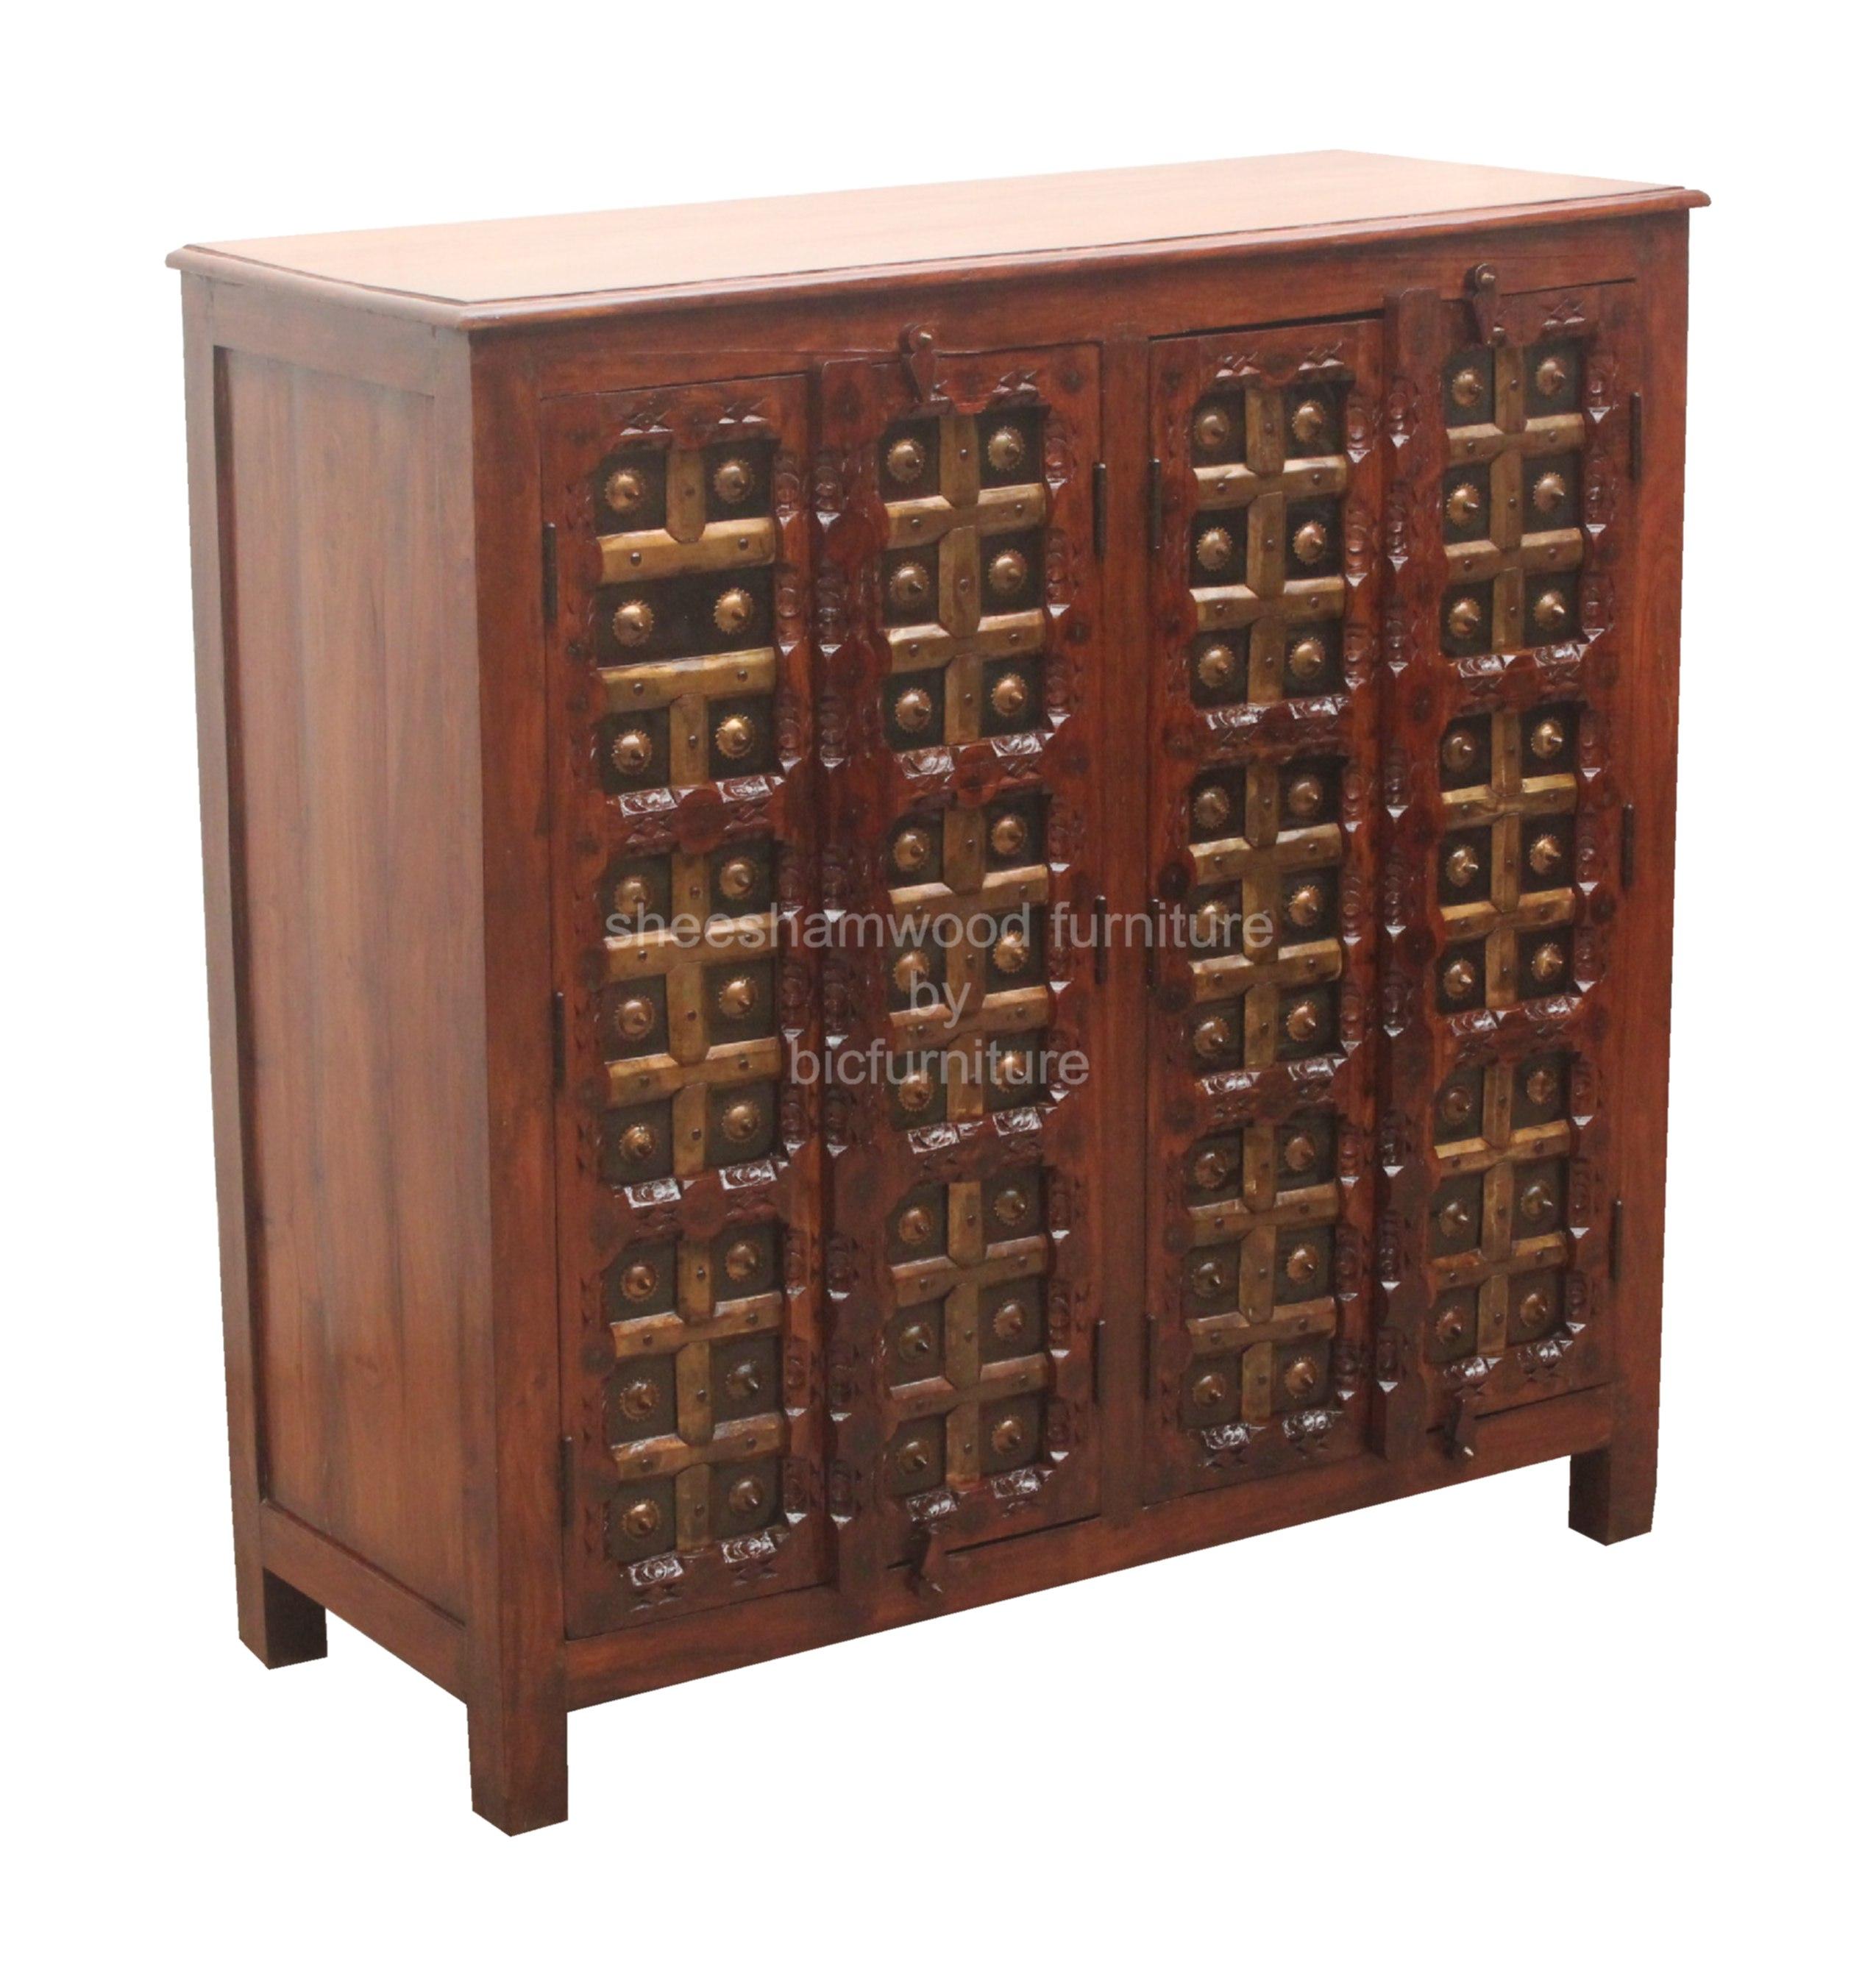 Antique_sideboard_sheesham. Brass_cabinet_antique.  Brass_cabinet_antique_sheesham_wood